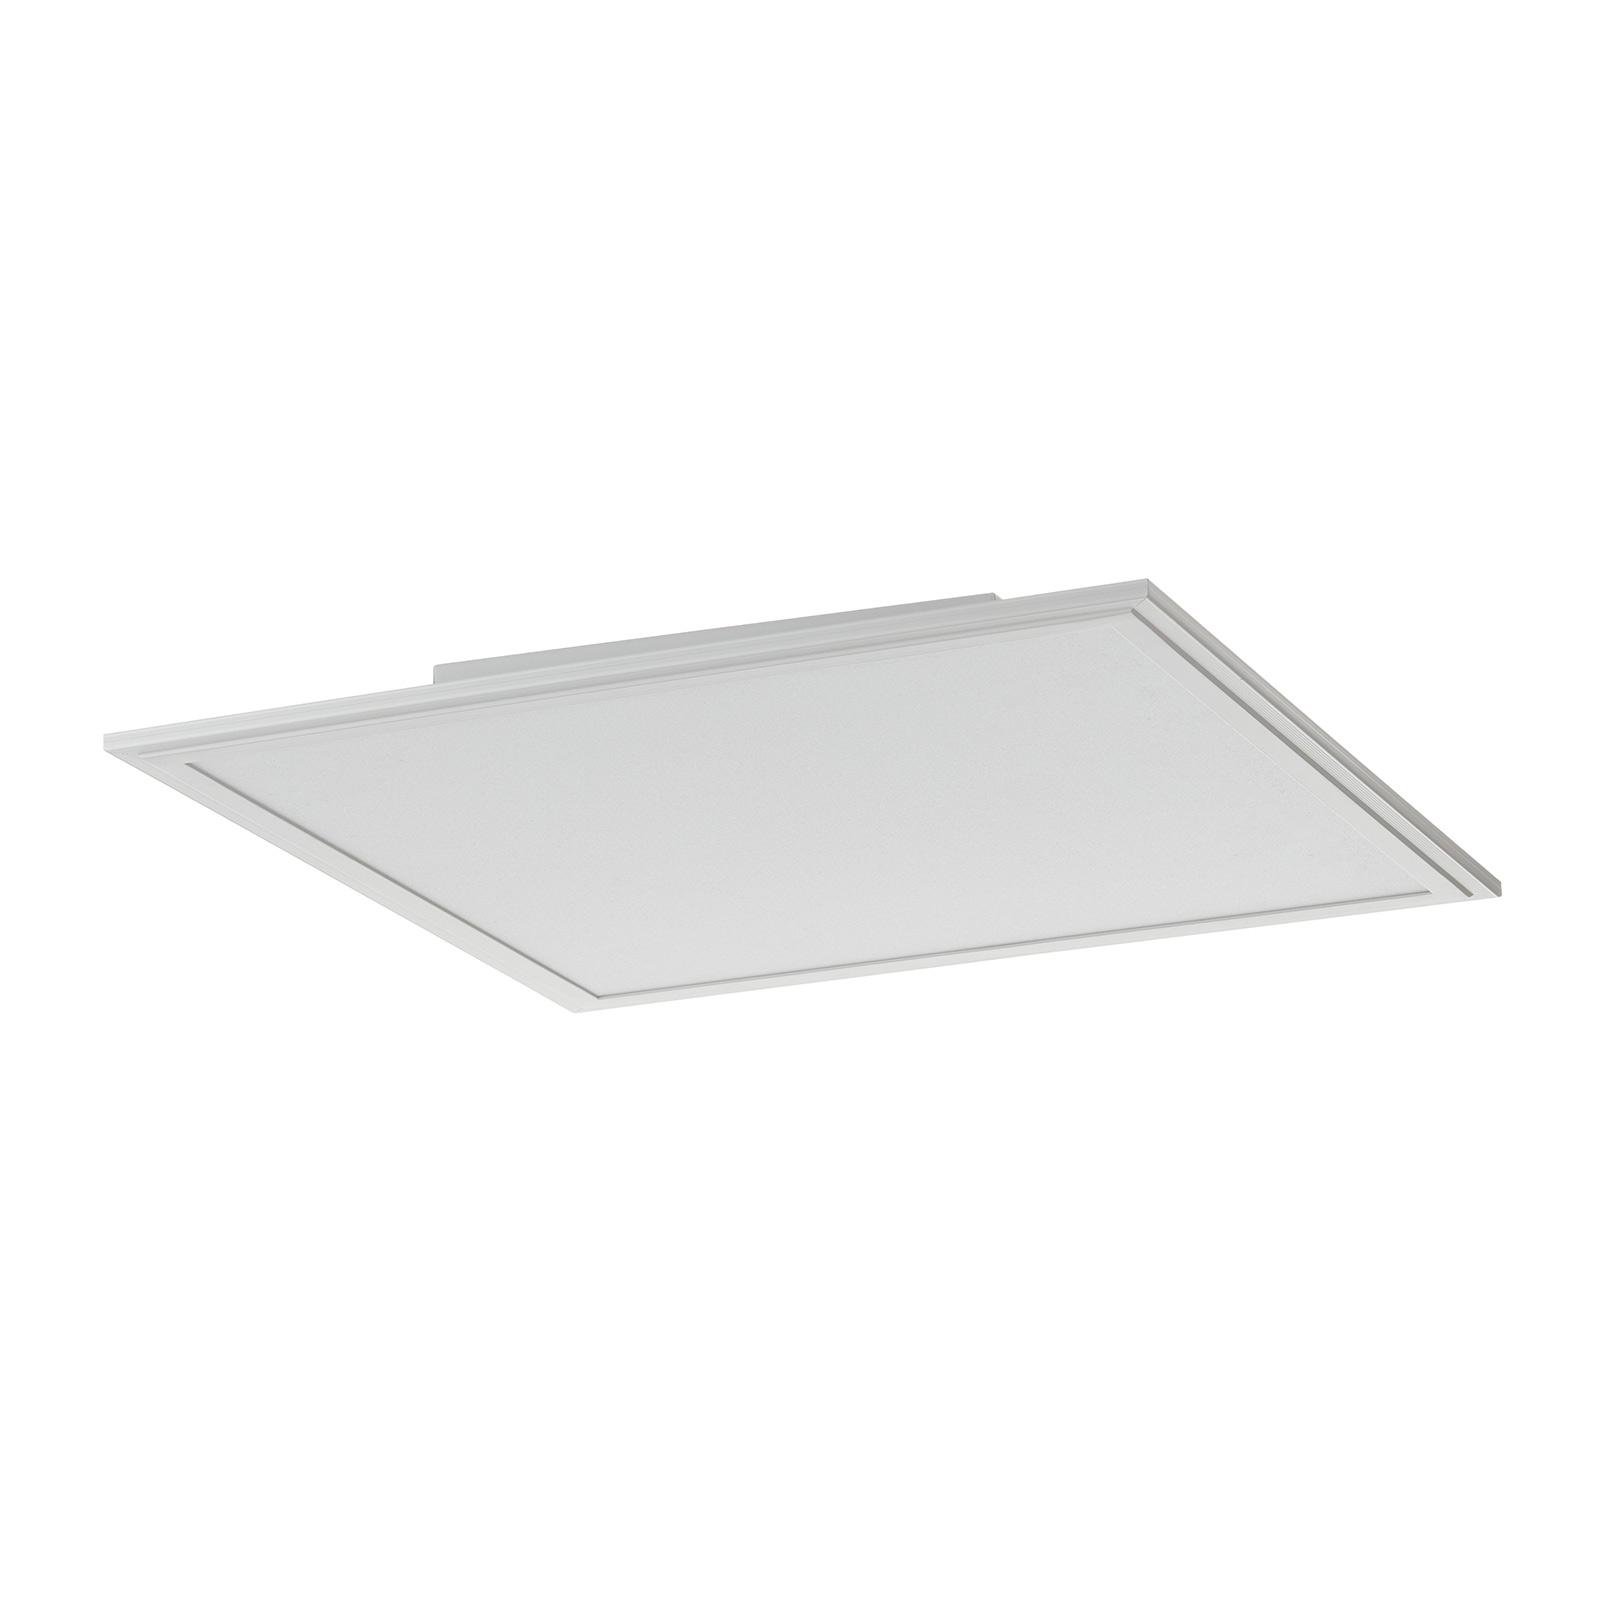 EGLO connect Salobrena-C panel LED, 45x45cm